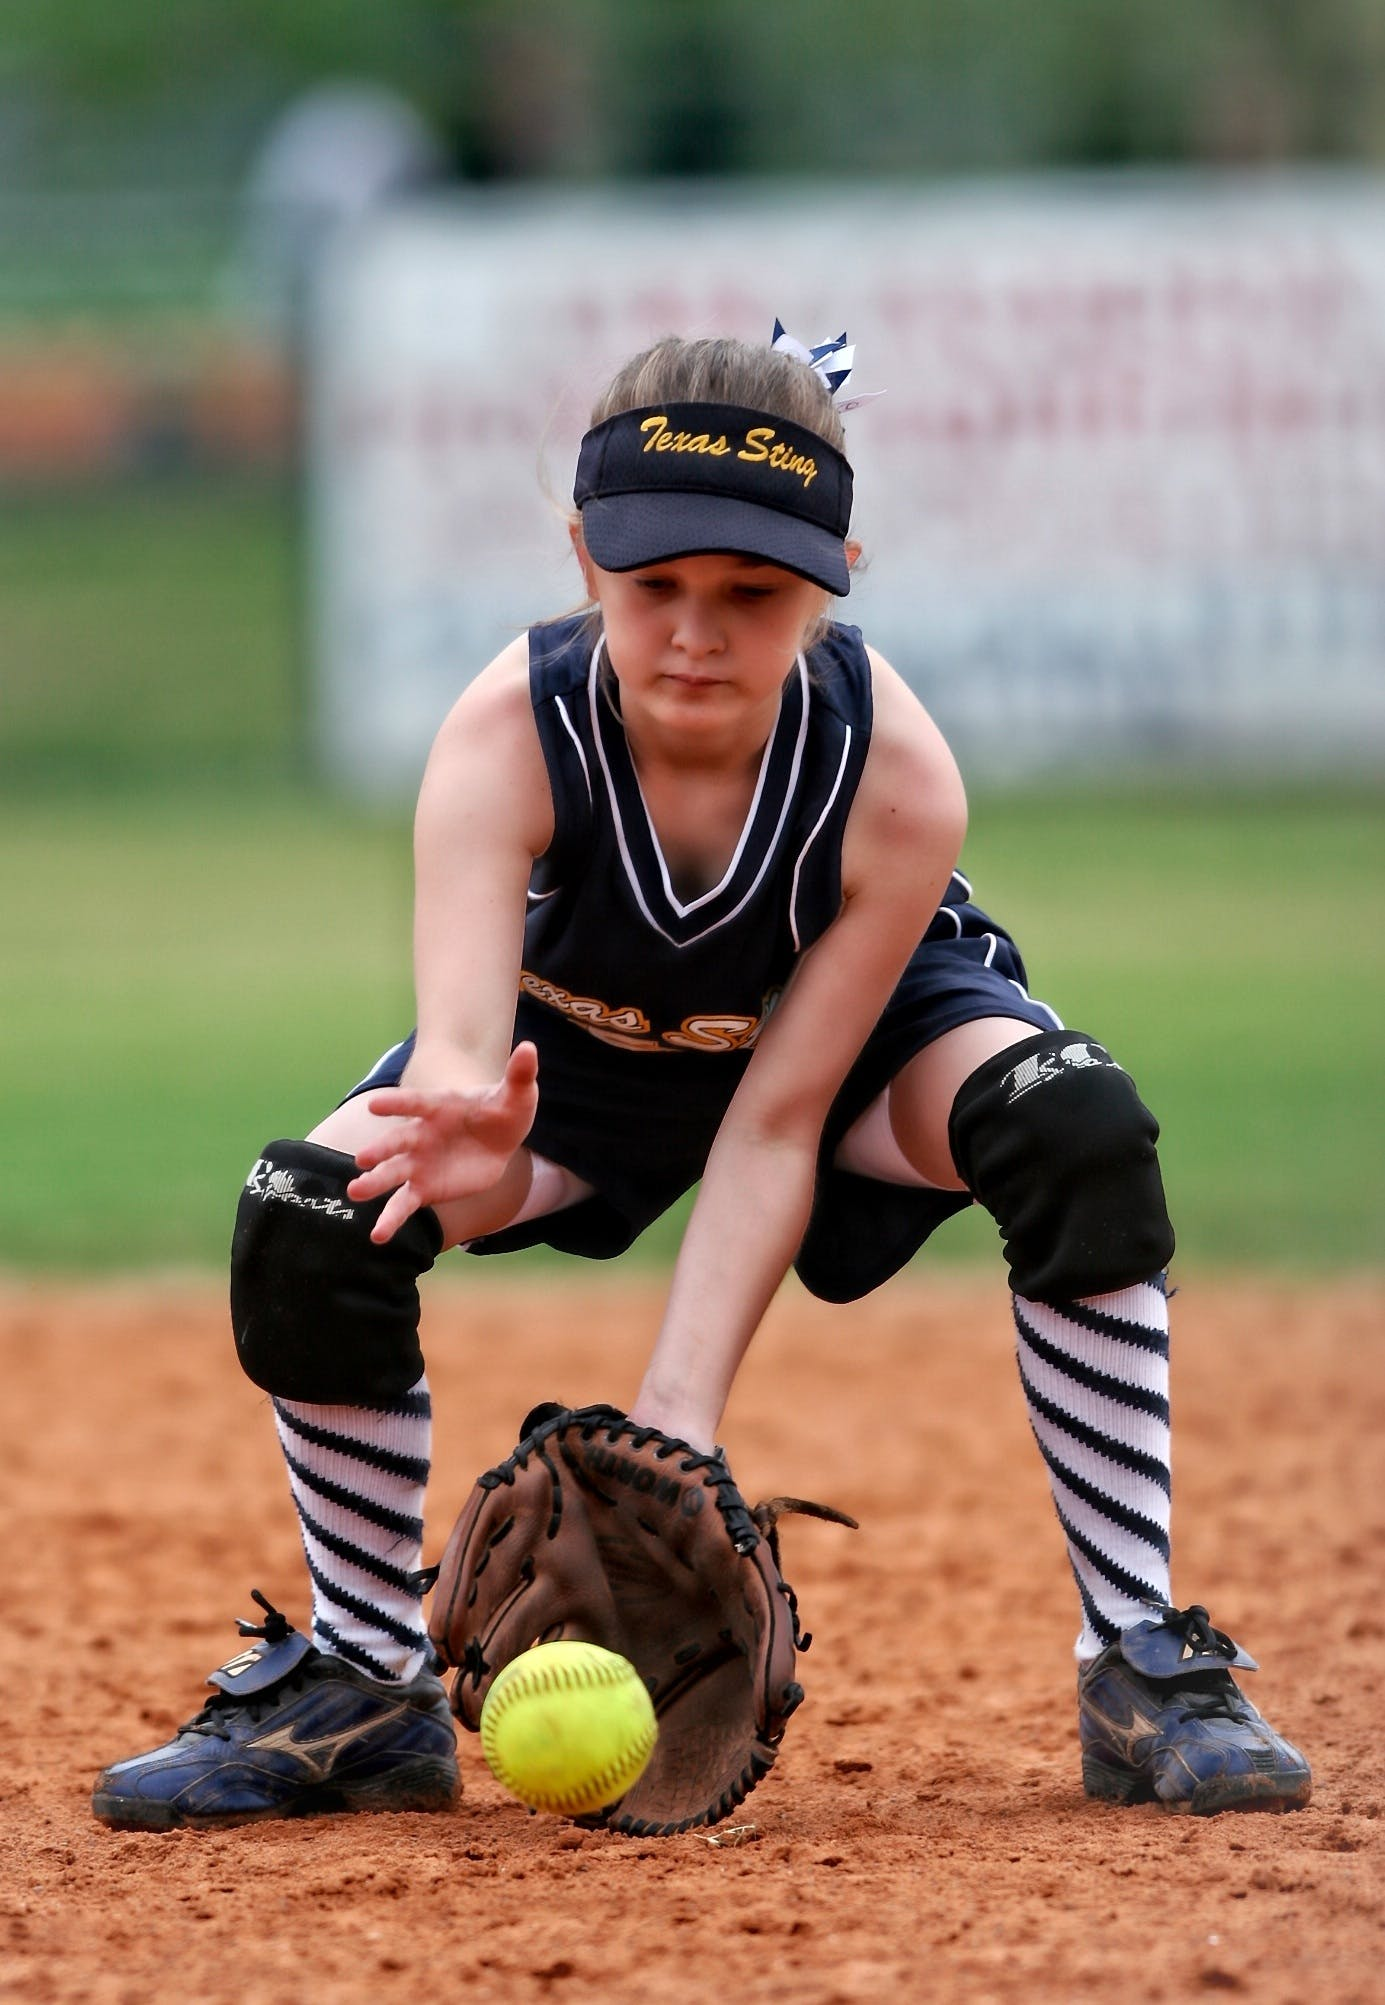 baseball, chytač, dítě